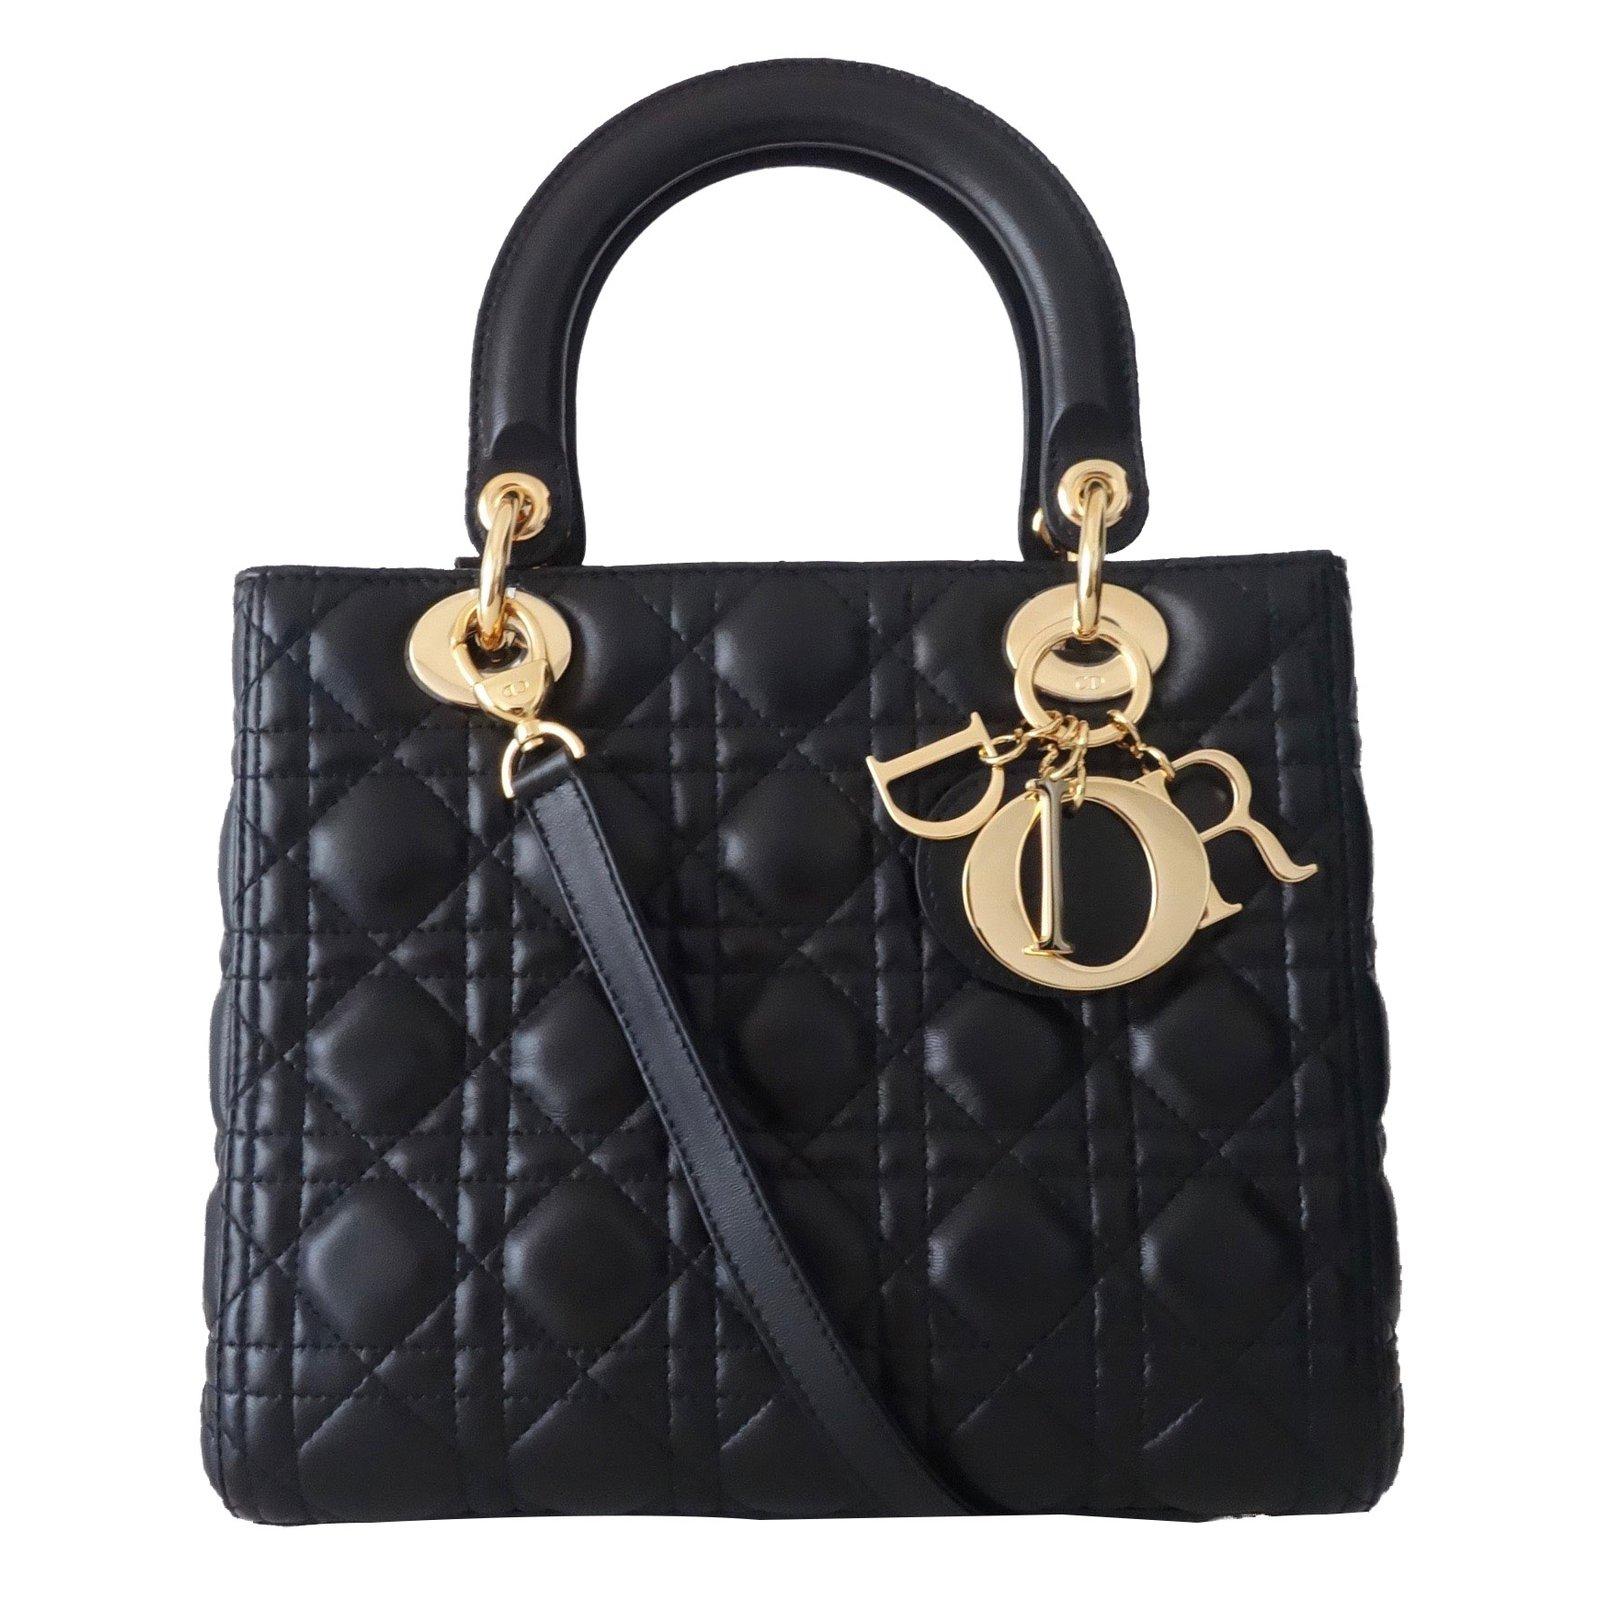 Sacs à main Christian Dior SAC LADY DIOR NOIR MEDIUM Cuir Noir ref.44821 0e450de8b6d